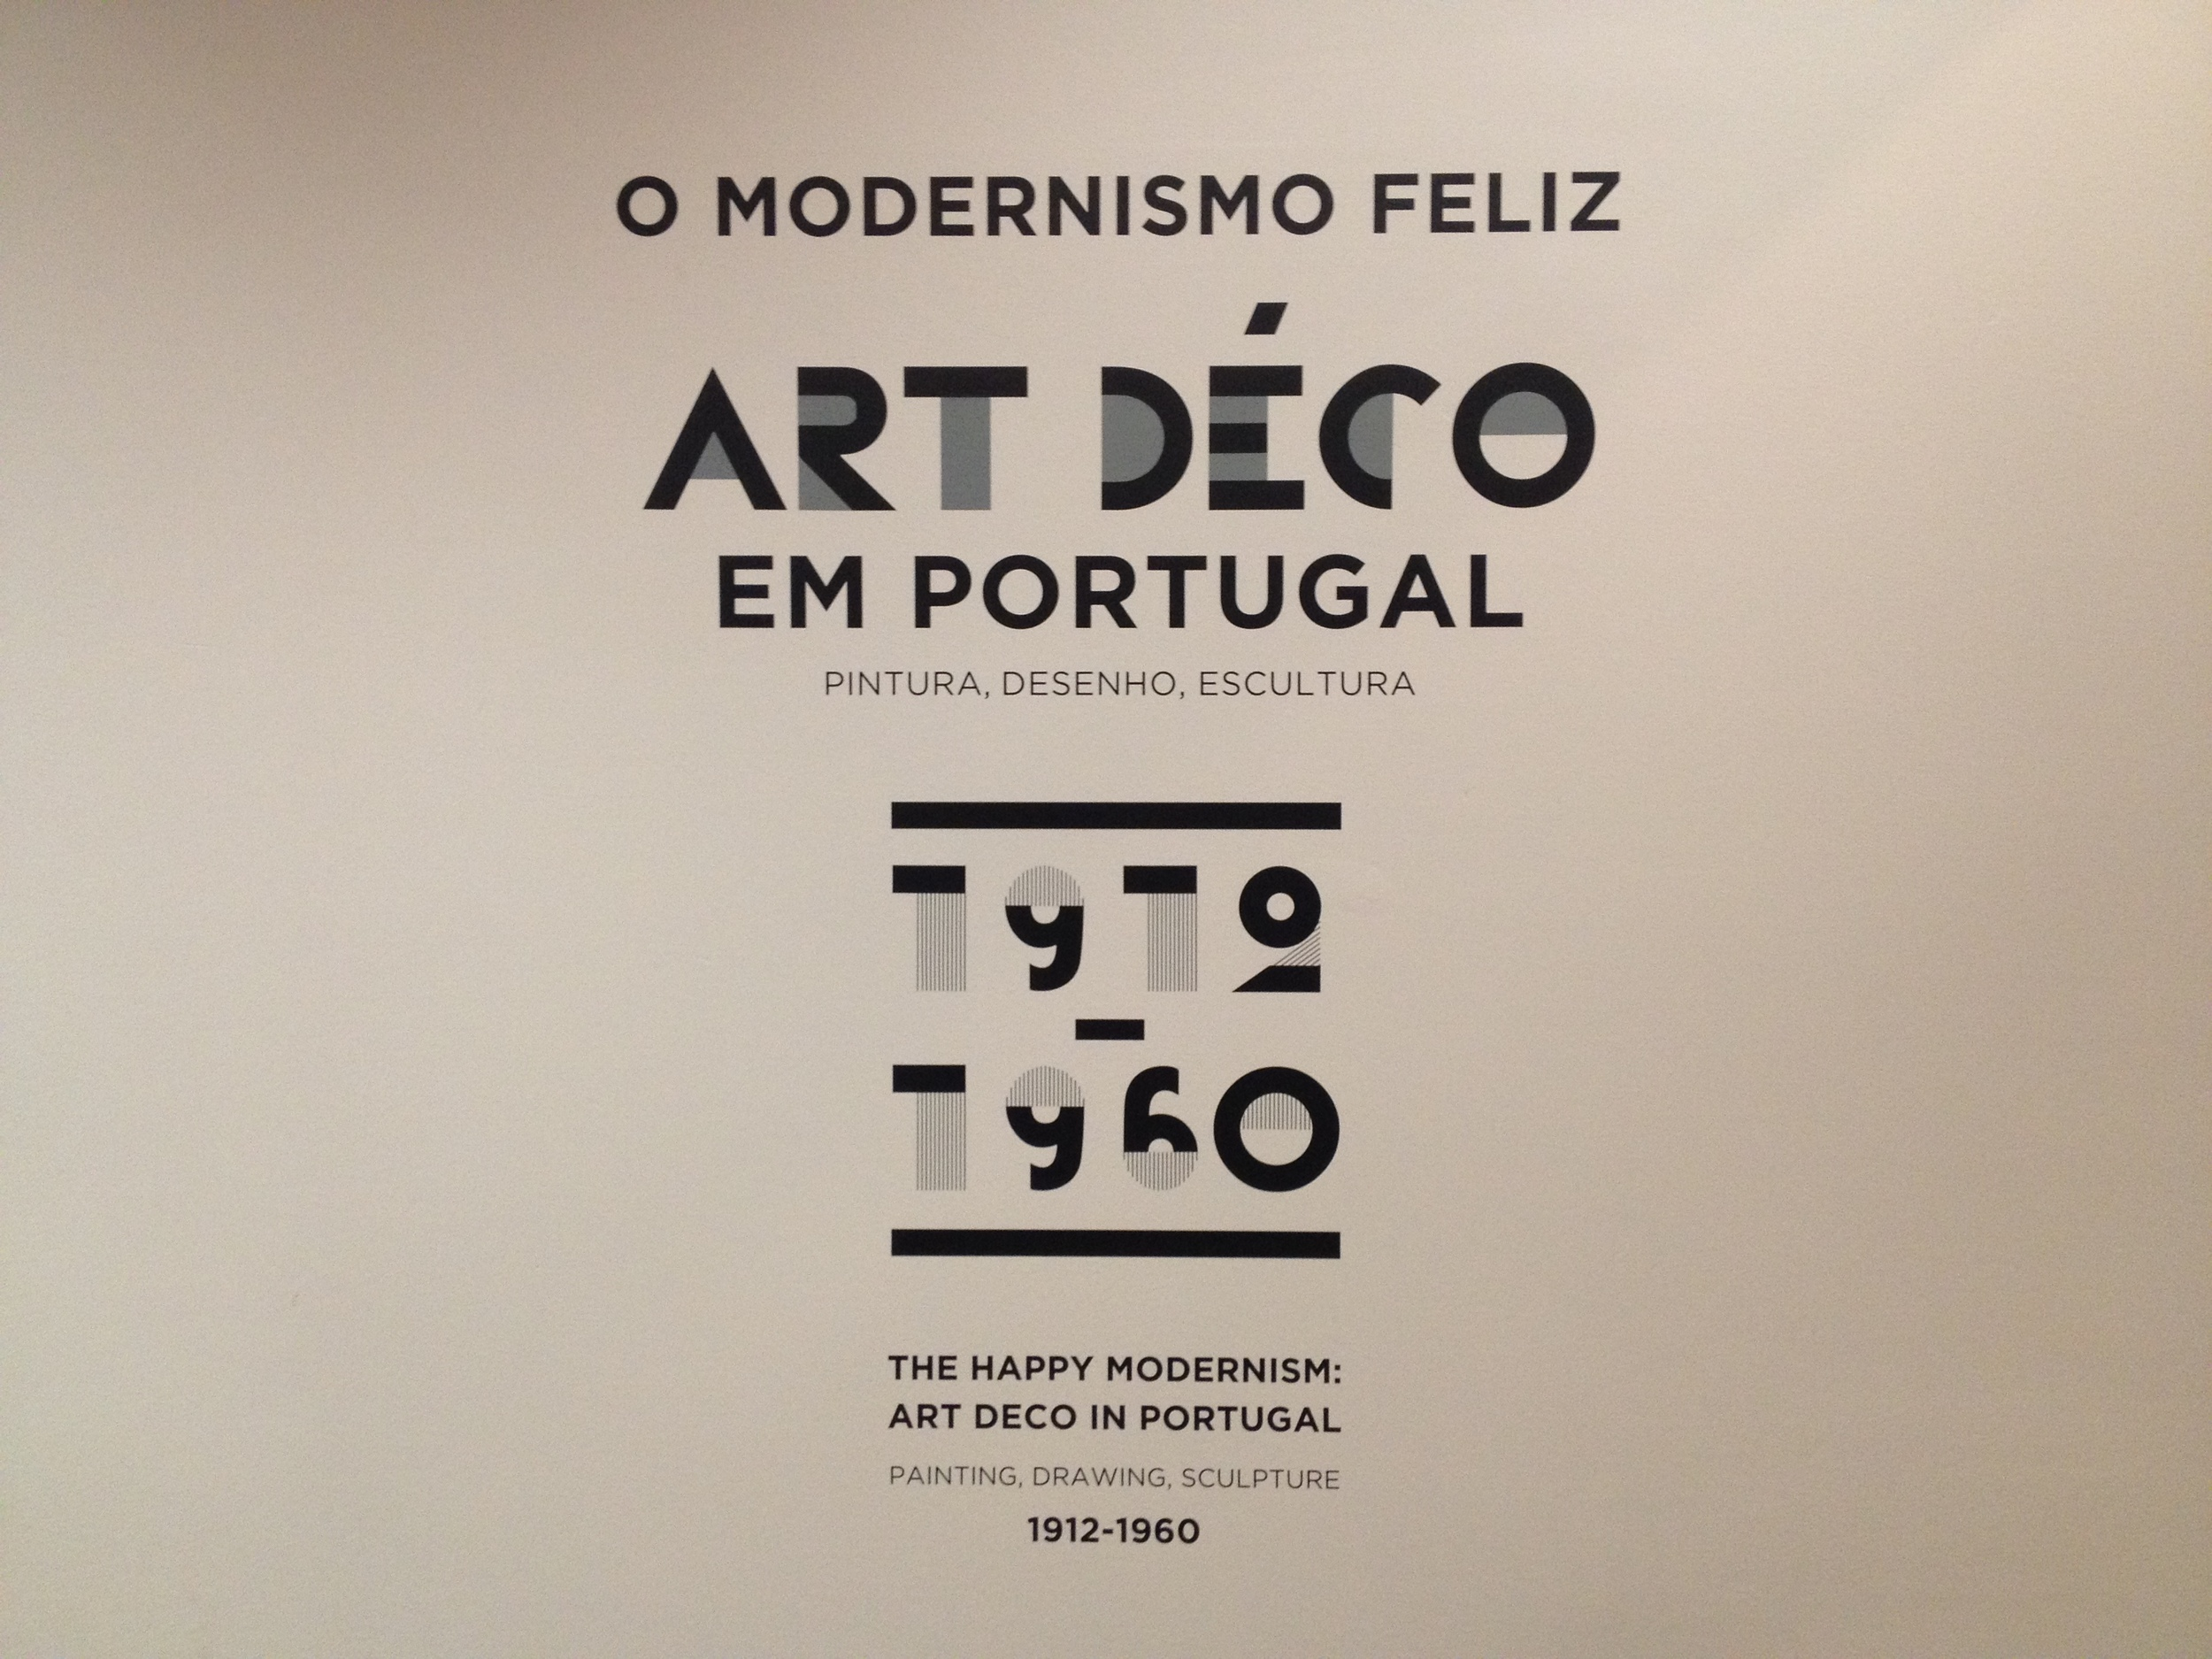 ART DECO EM PORTUGAL - Portuguese Art Deco Exhibition, Chiado Museum, Lisbon